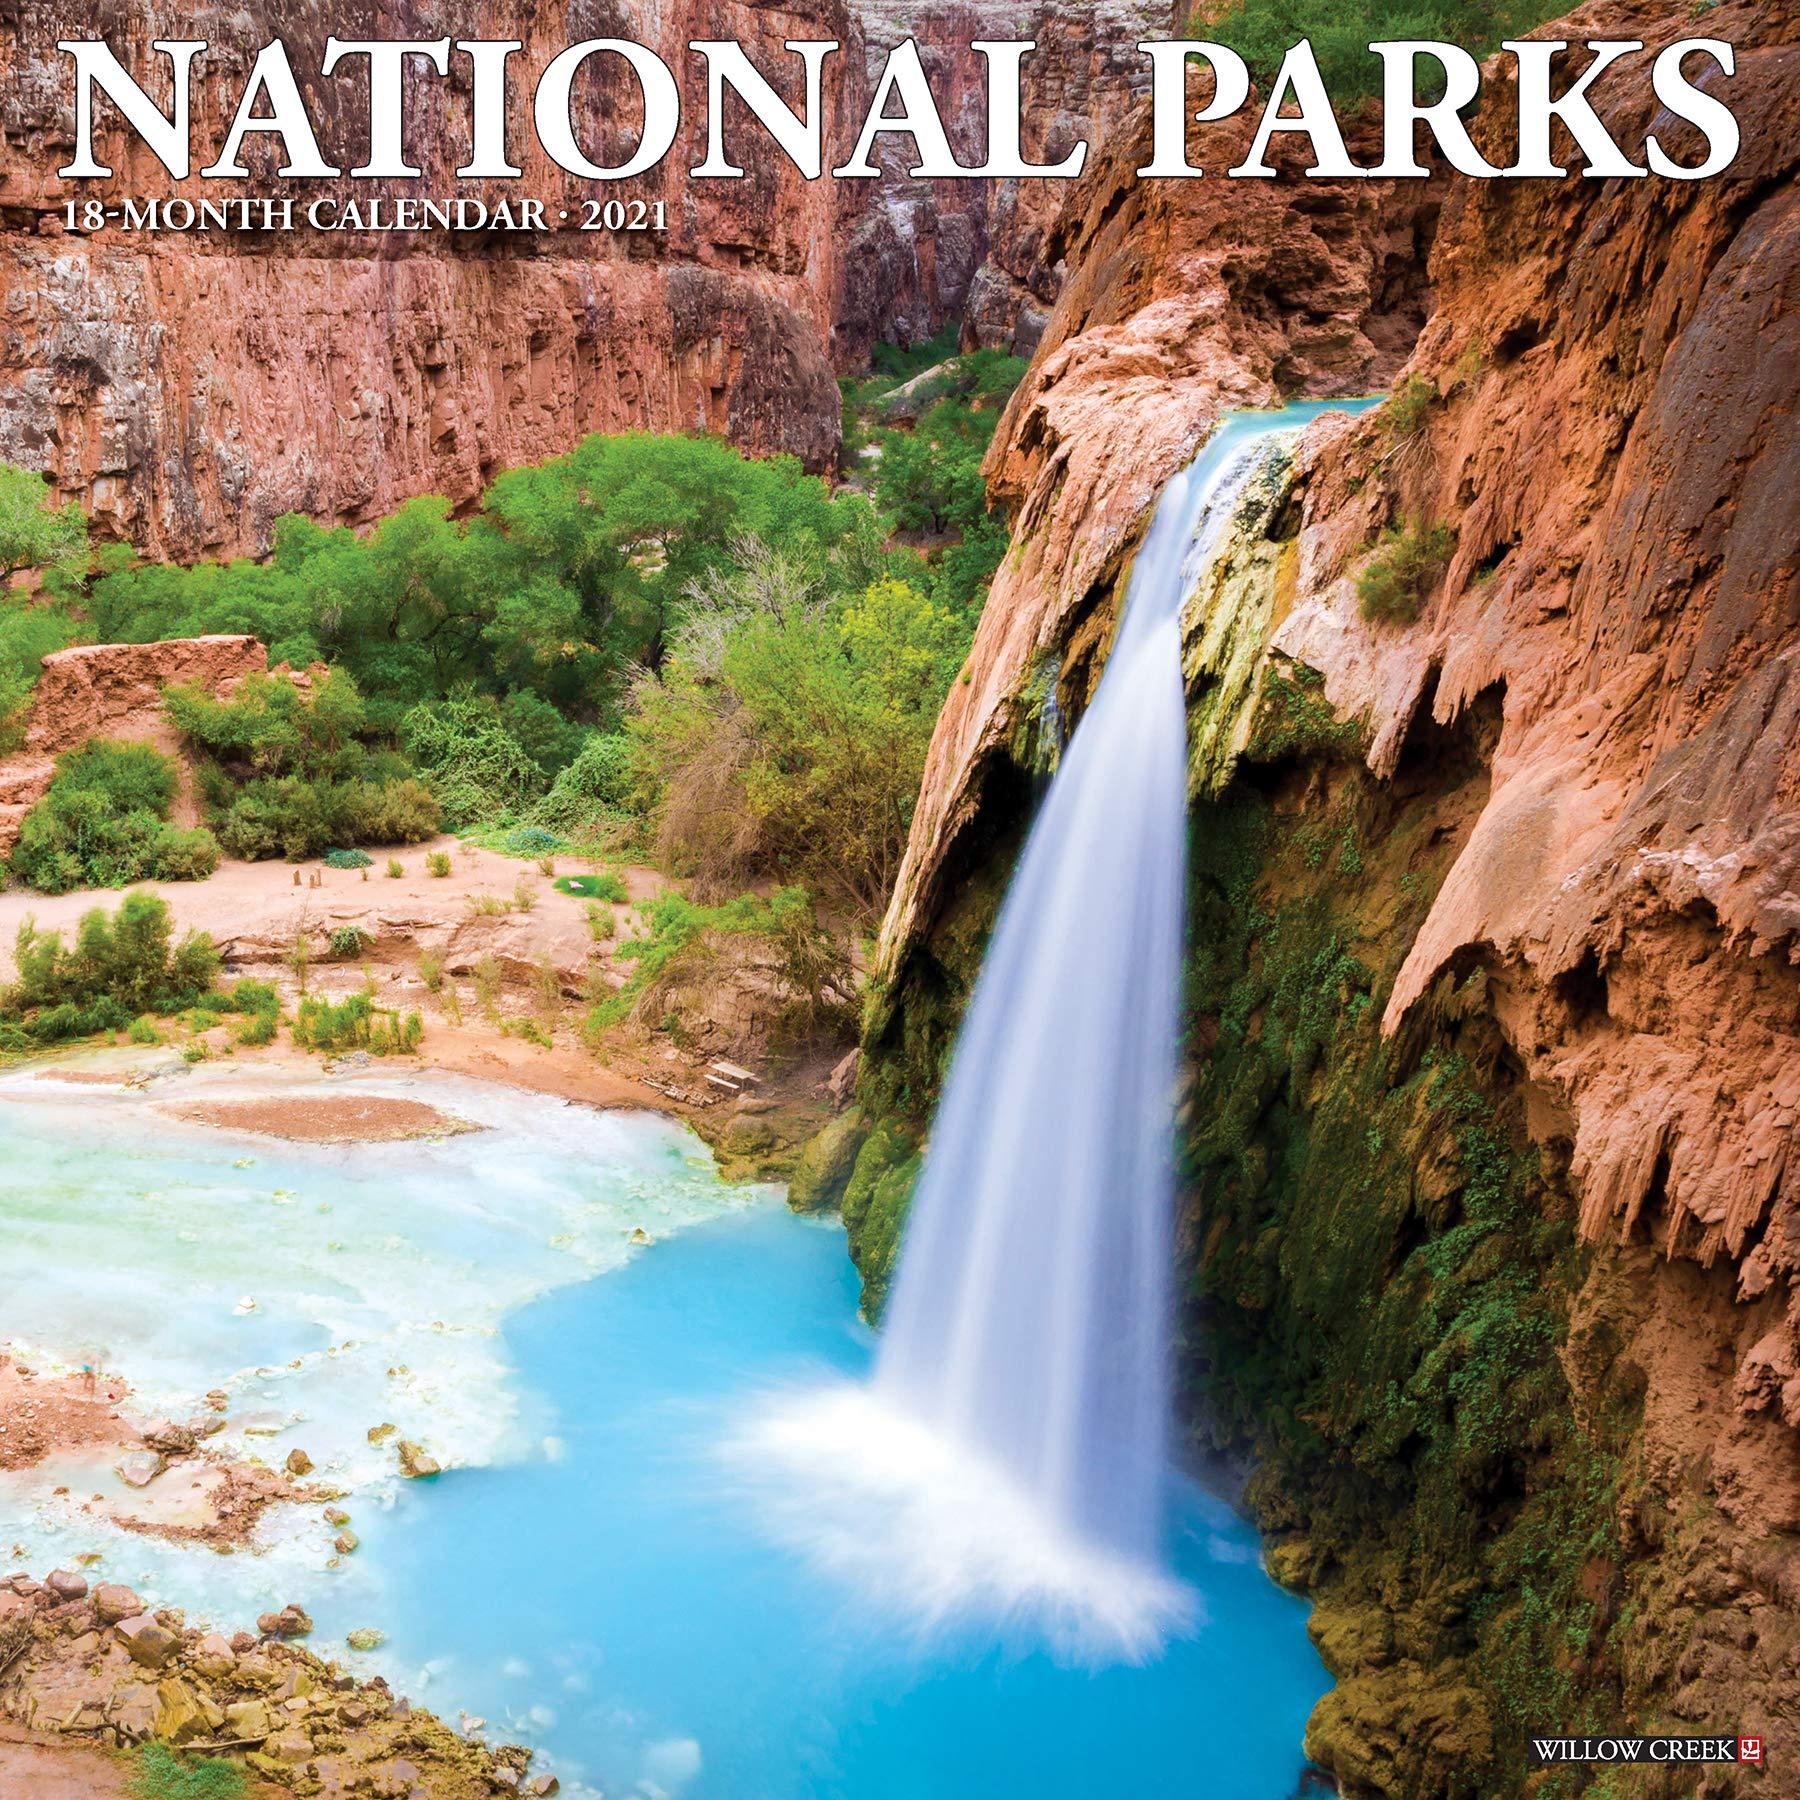 National Parks Calendar 2022.National Parks 2021 Wall Calendar Willow Creek Press 9781549212697 Amazon Com Books